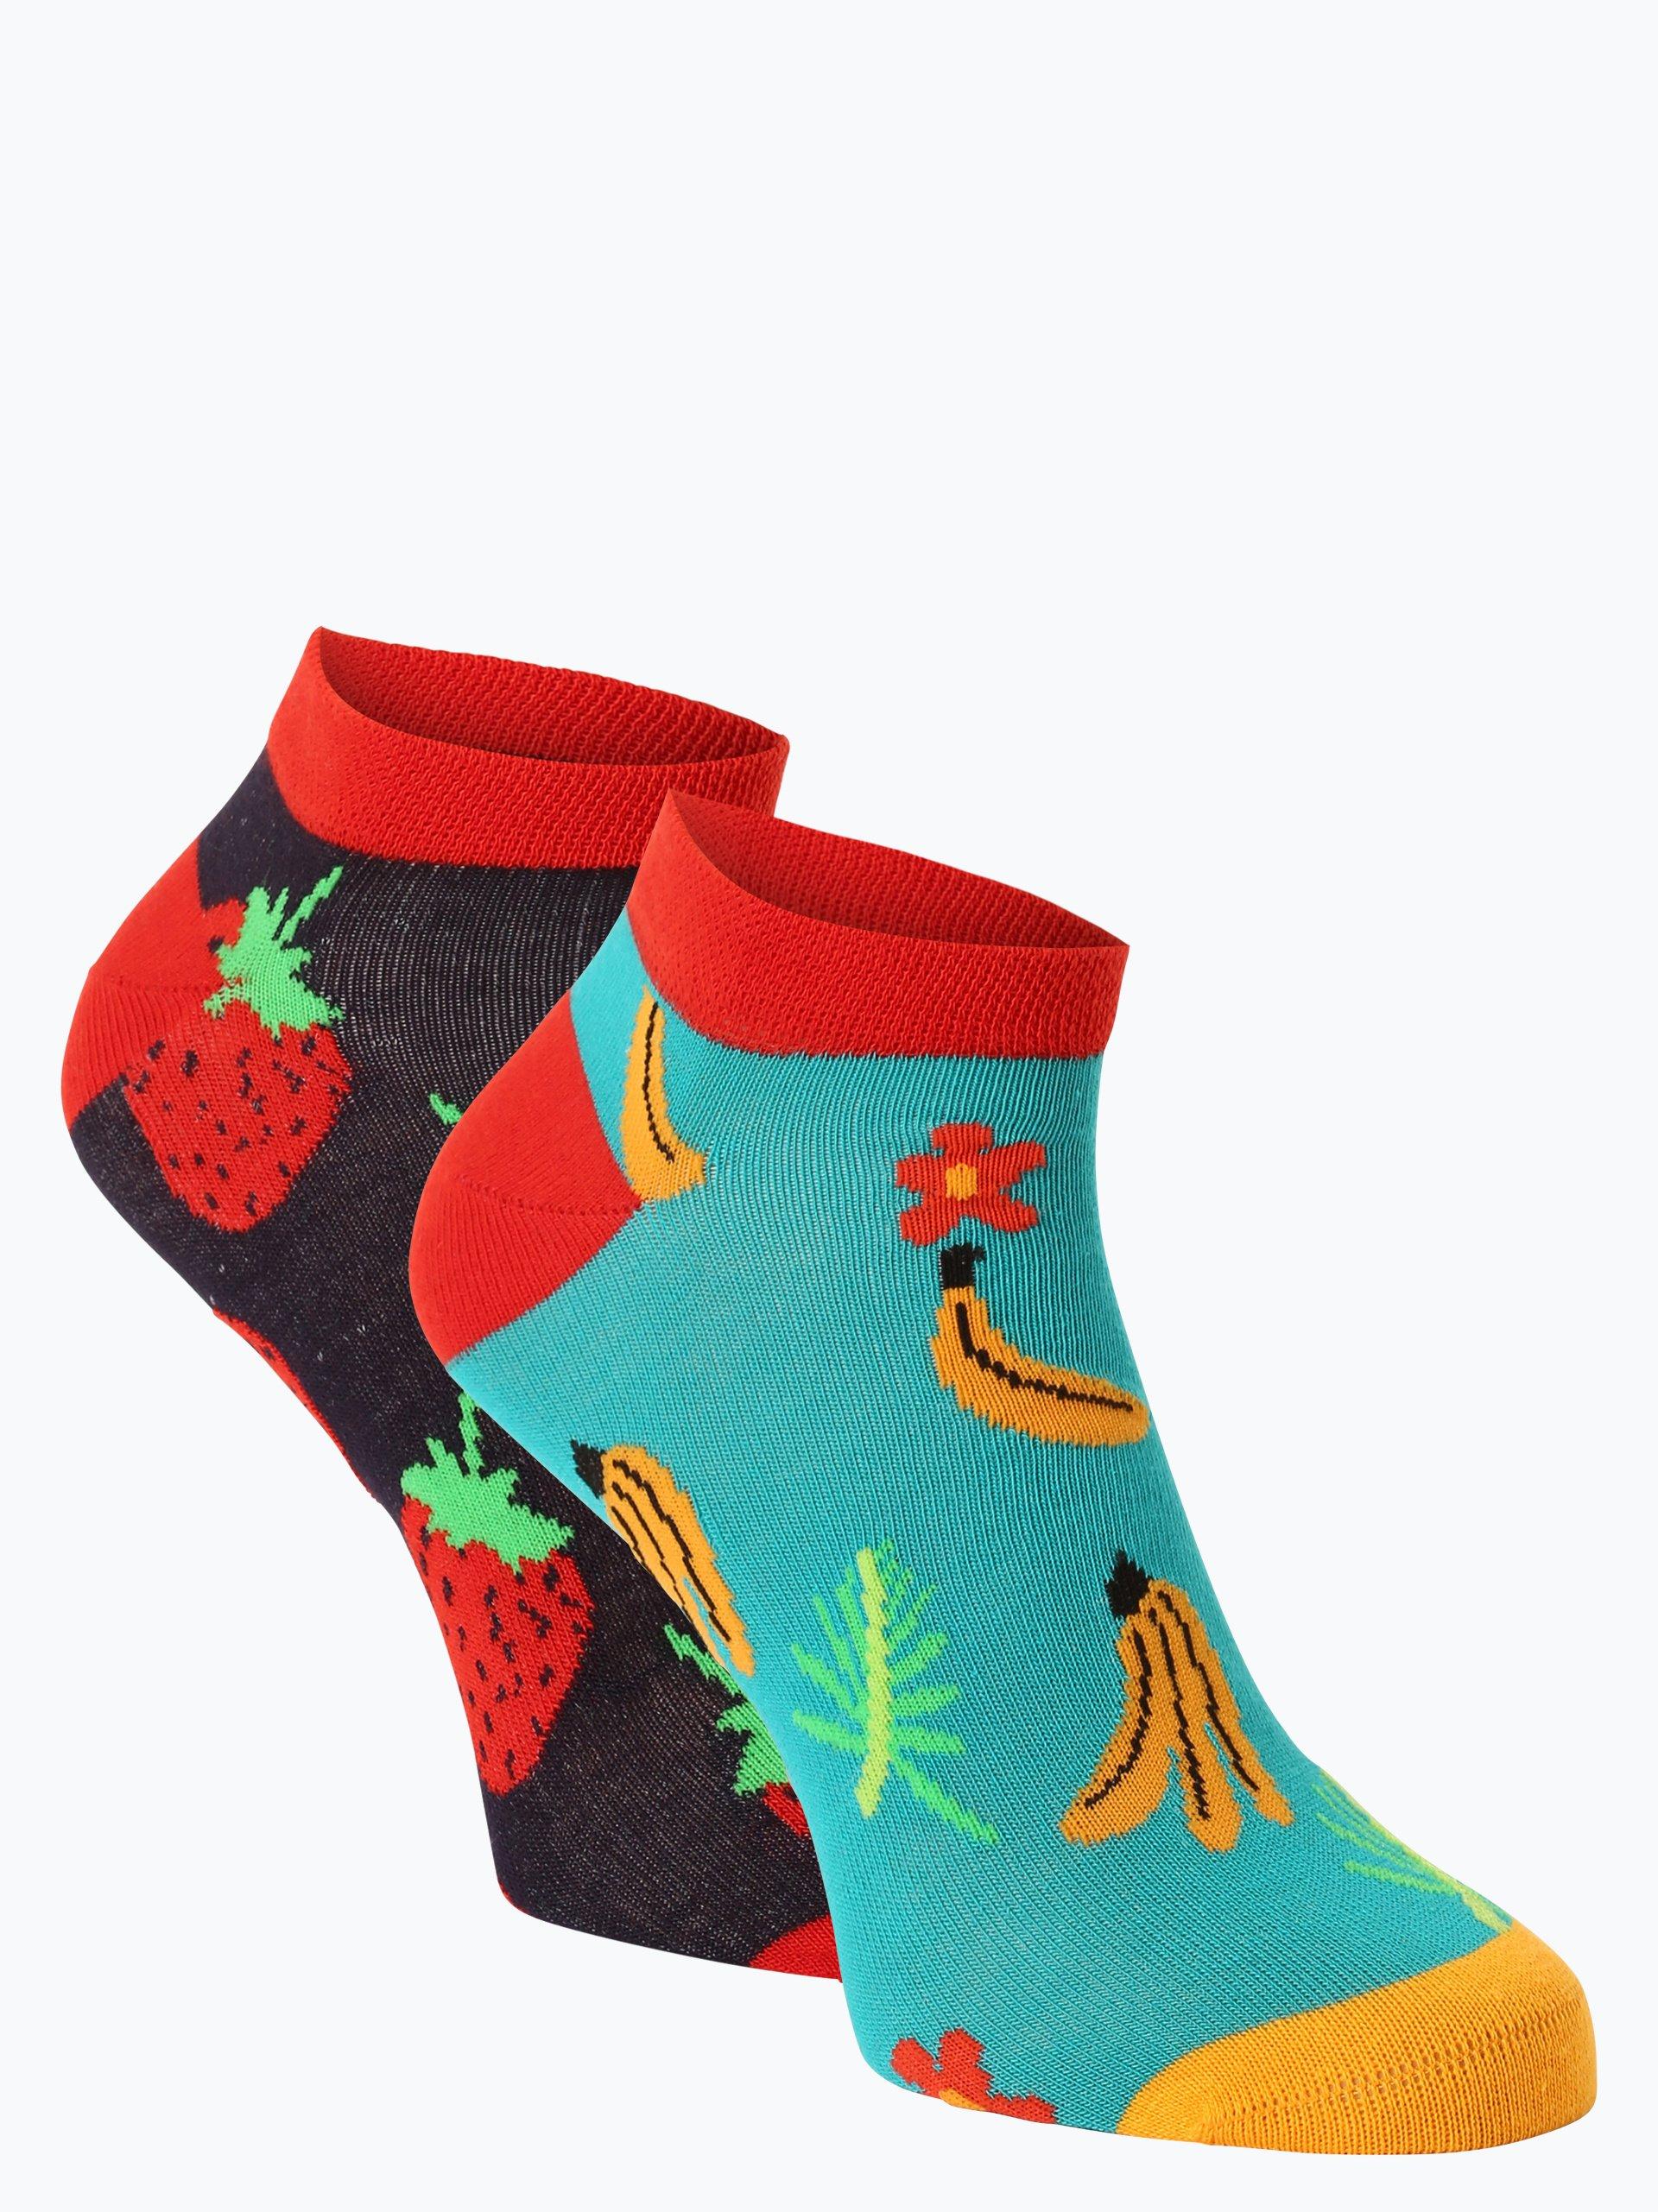 Unabux Damen Socken im 2er-Pack